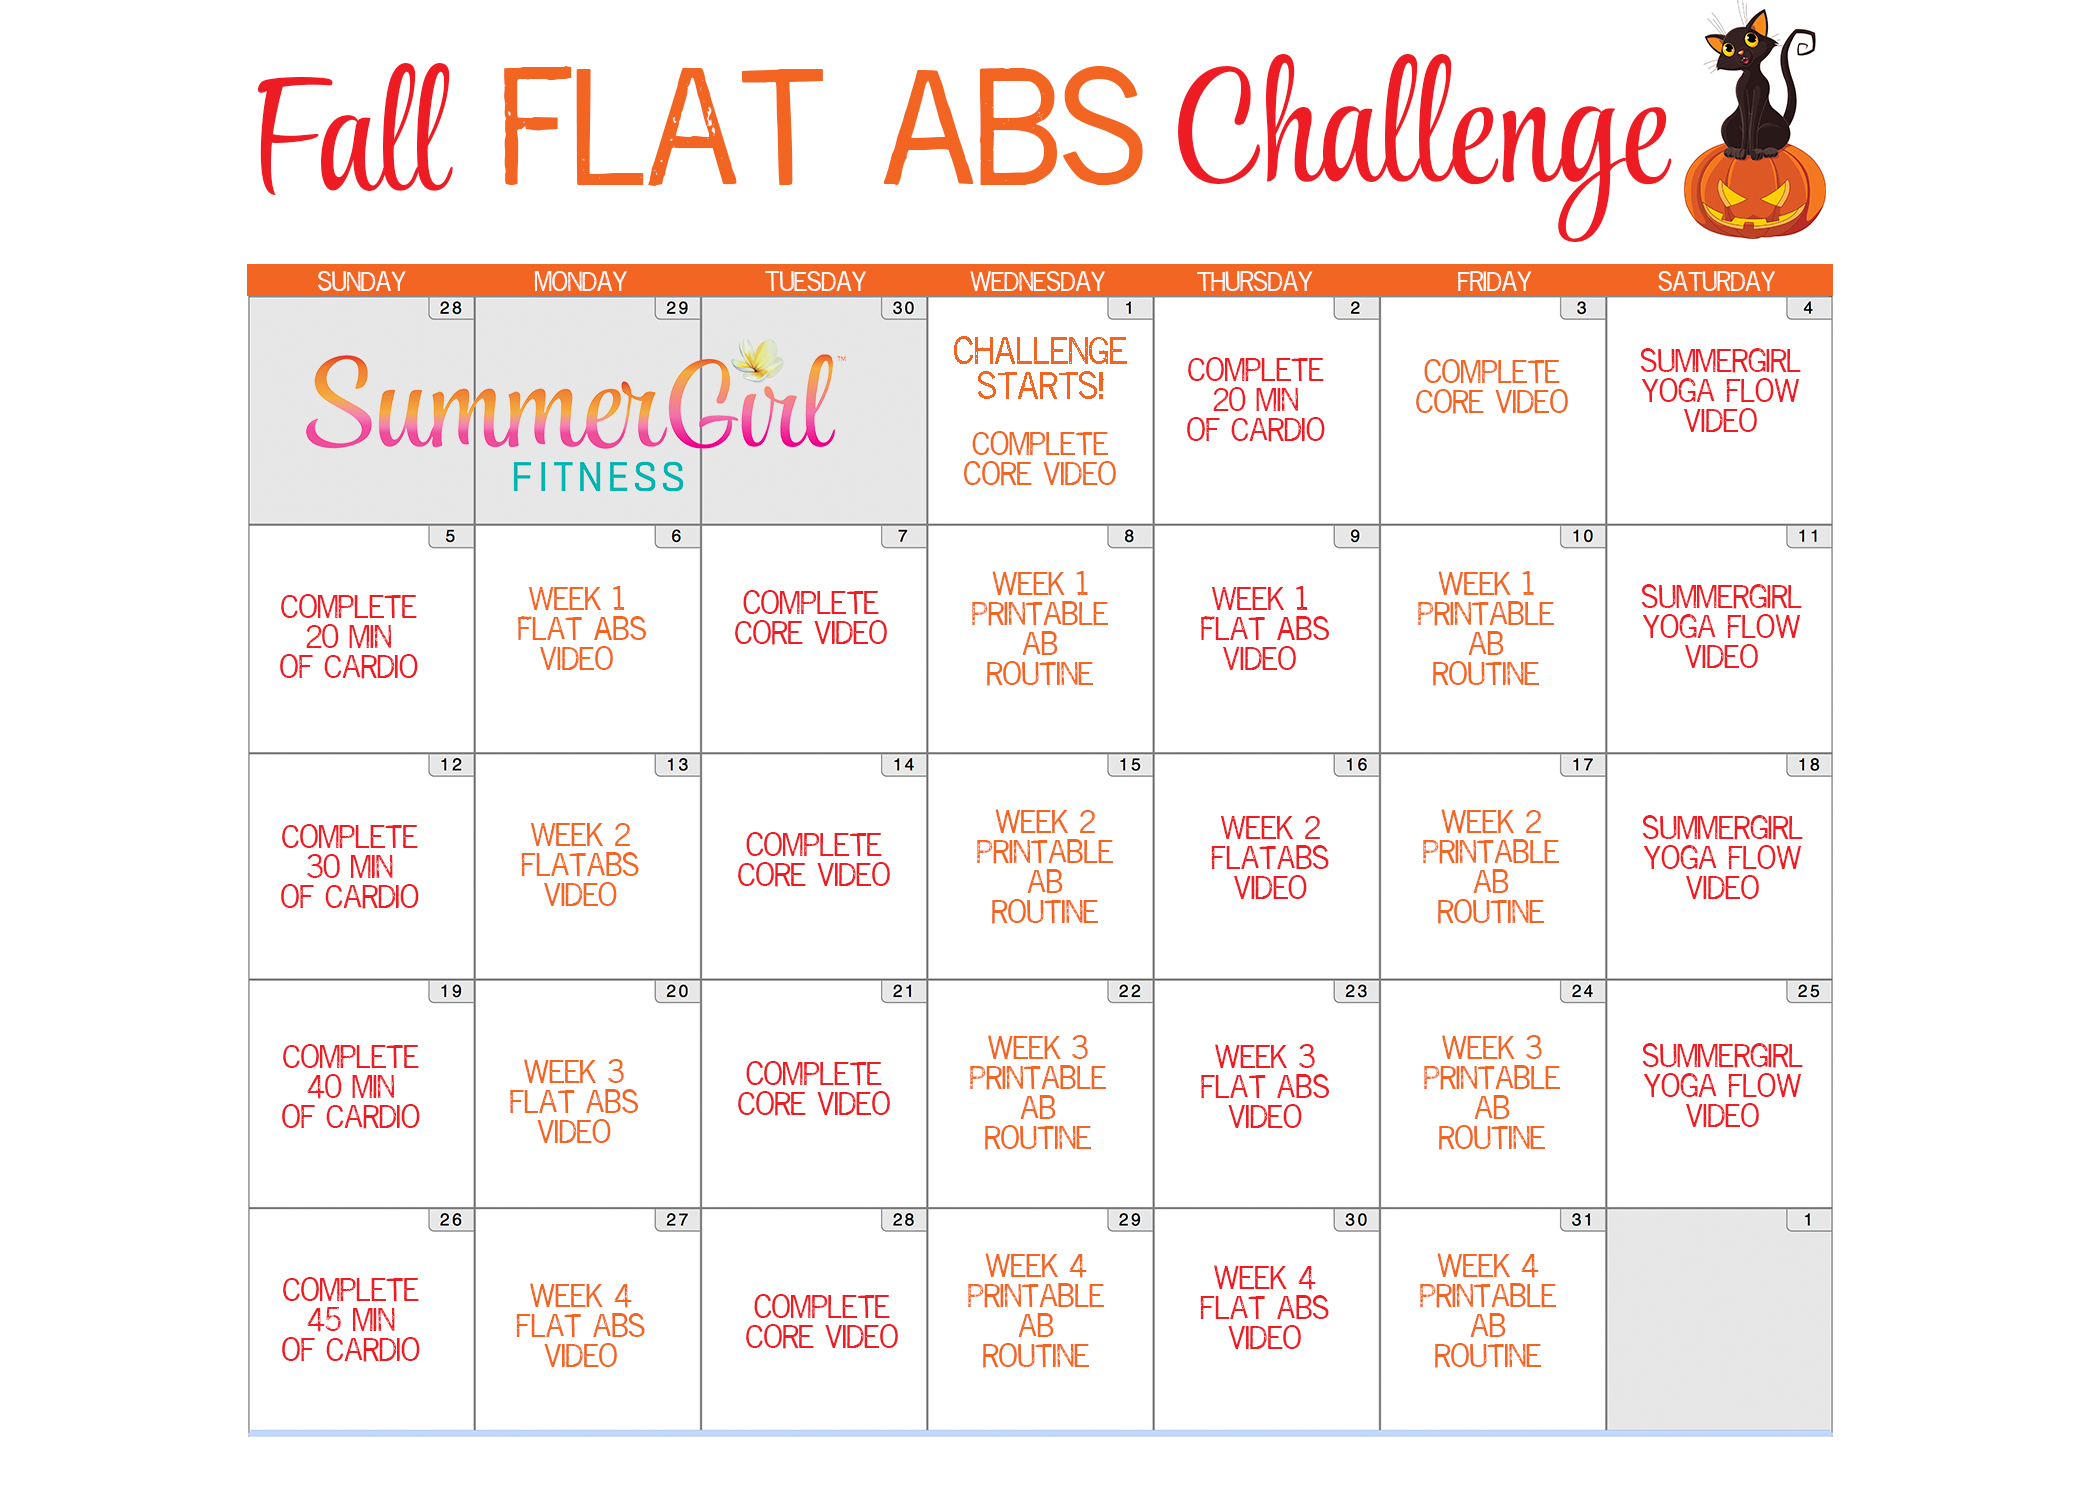 Fall Flat Abs Challenge Calendar | Summergirl Fitness Inside Ab Challenge Calendar Printable